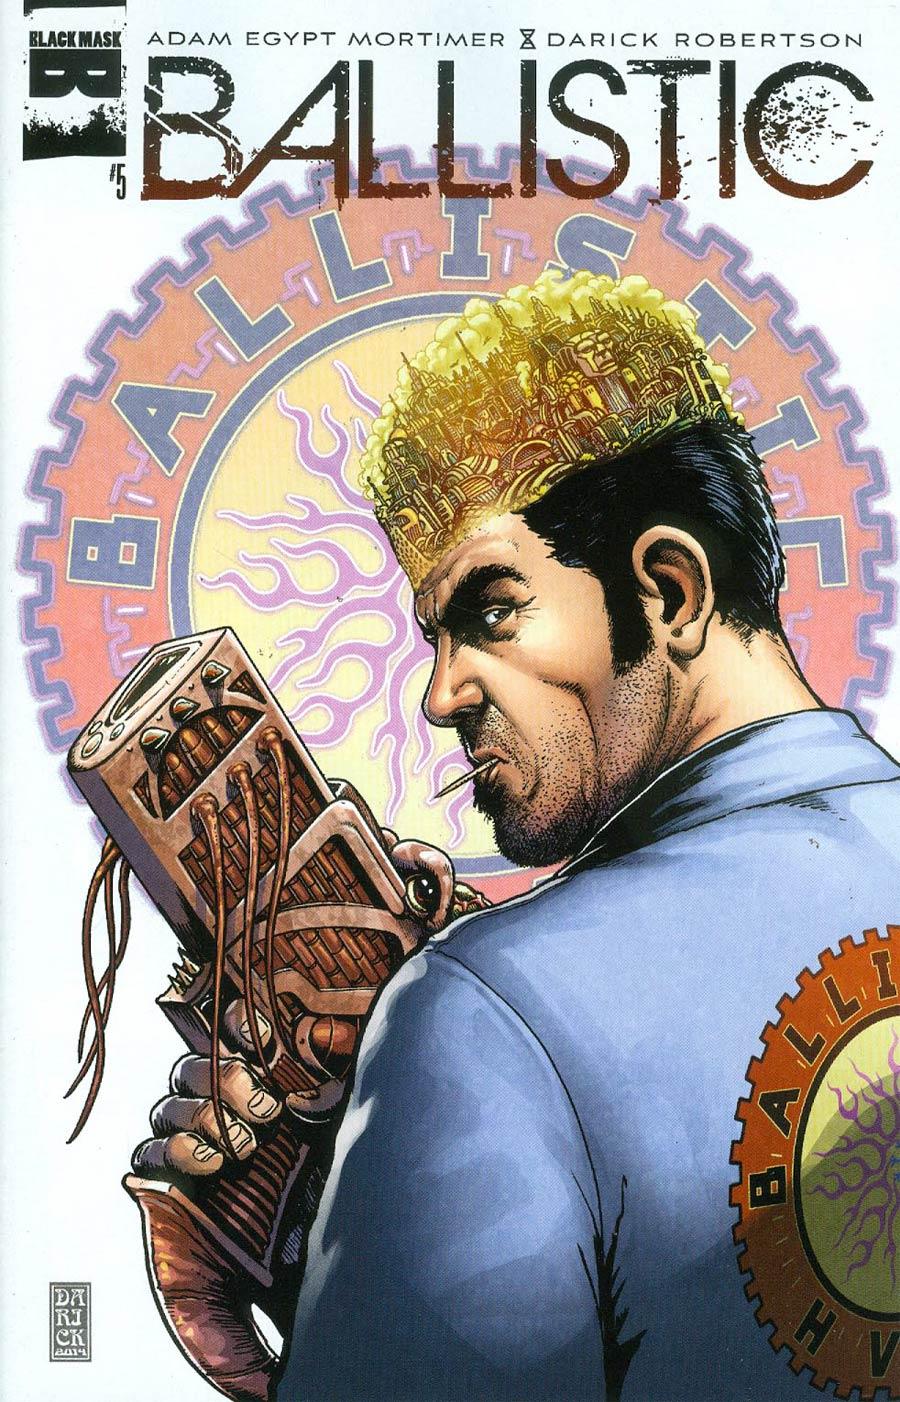 Ballistic (Black Mask Comics) #5